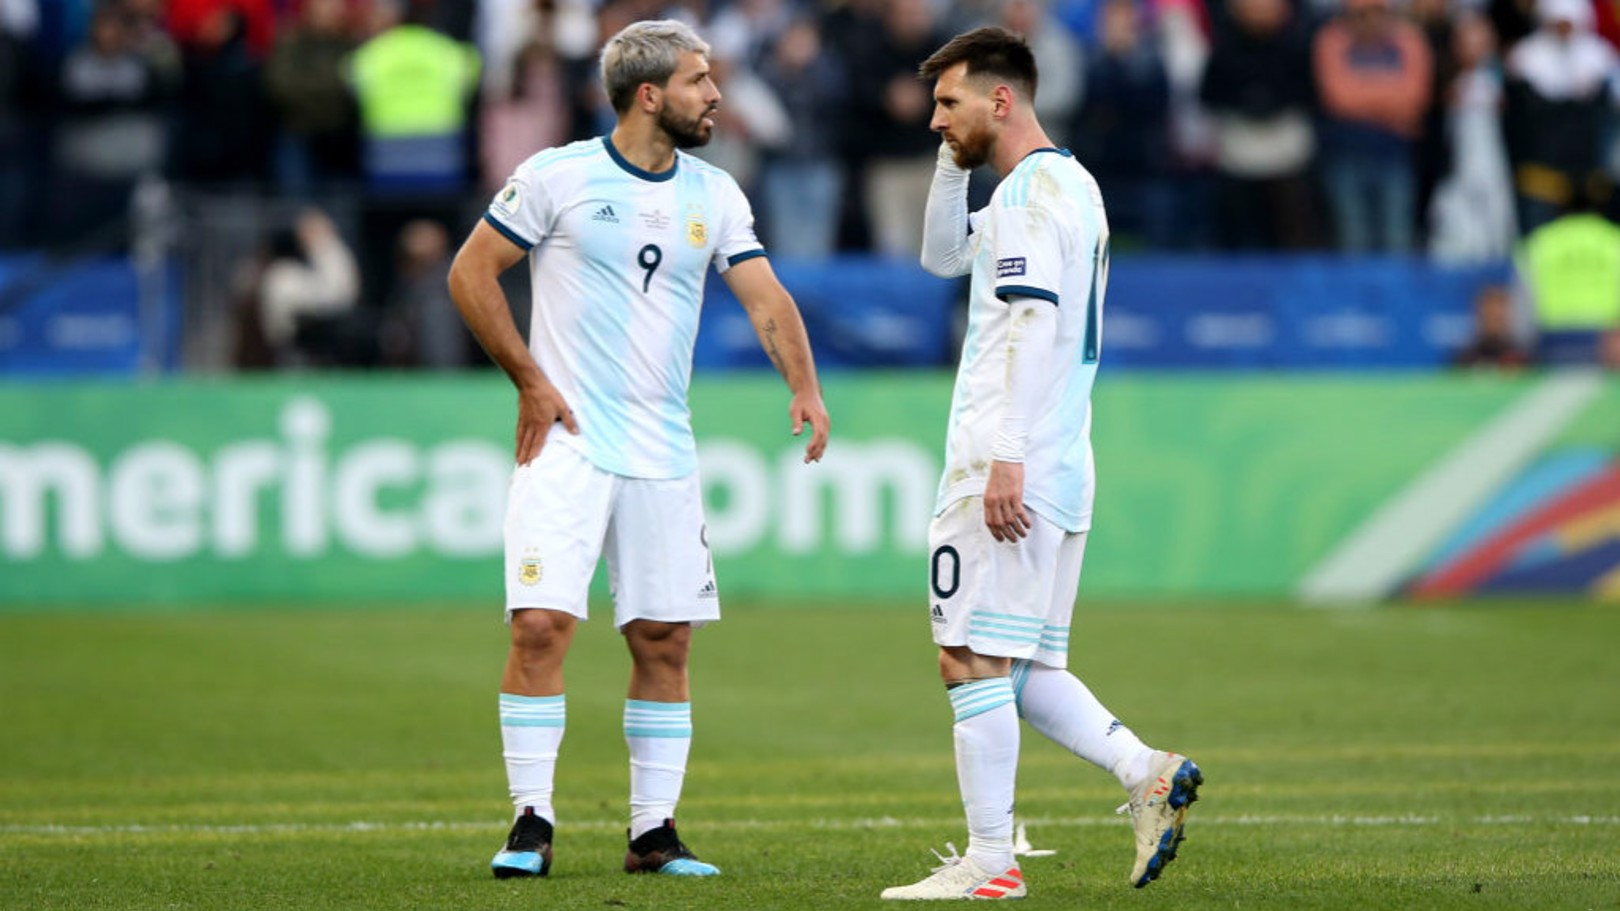 TIMNAS MEMANGGIL: 18 pemain City akan melakoni laga internasional membela negaranya